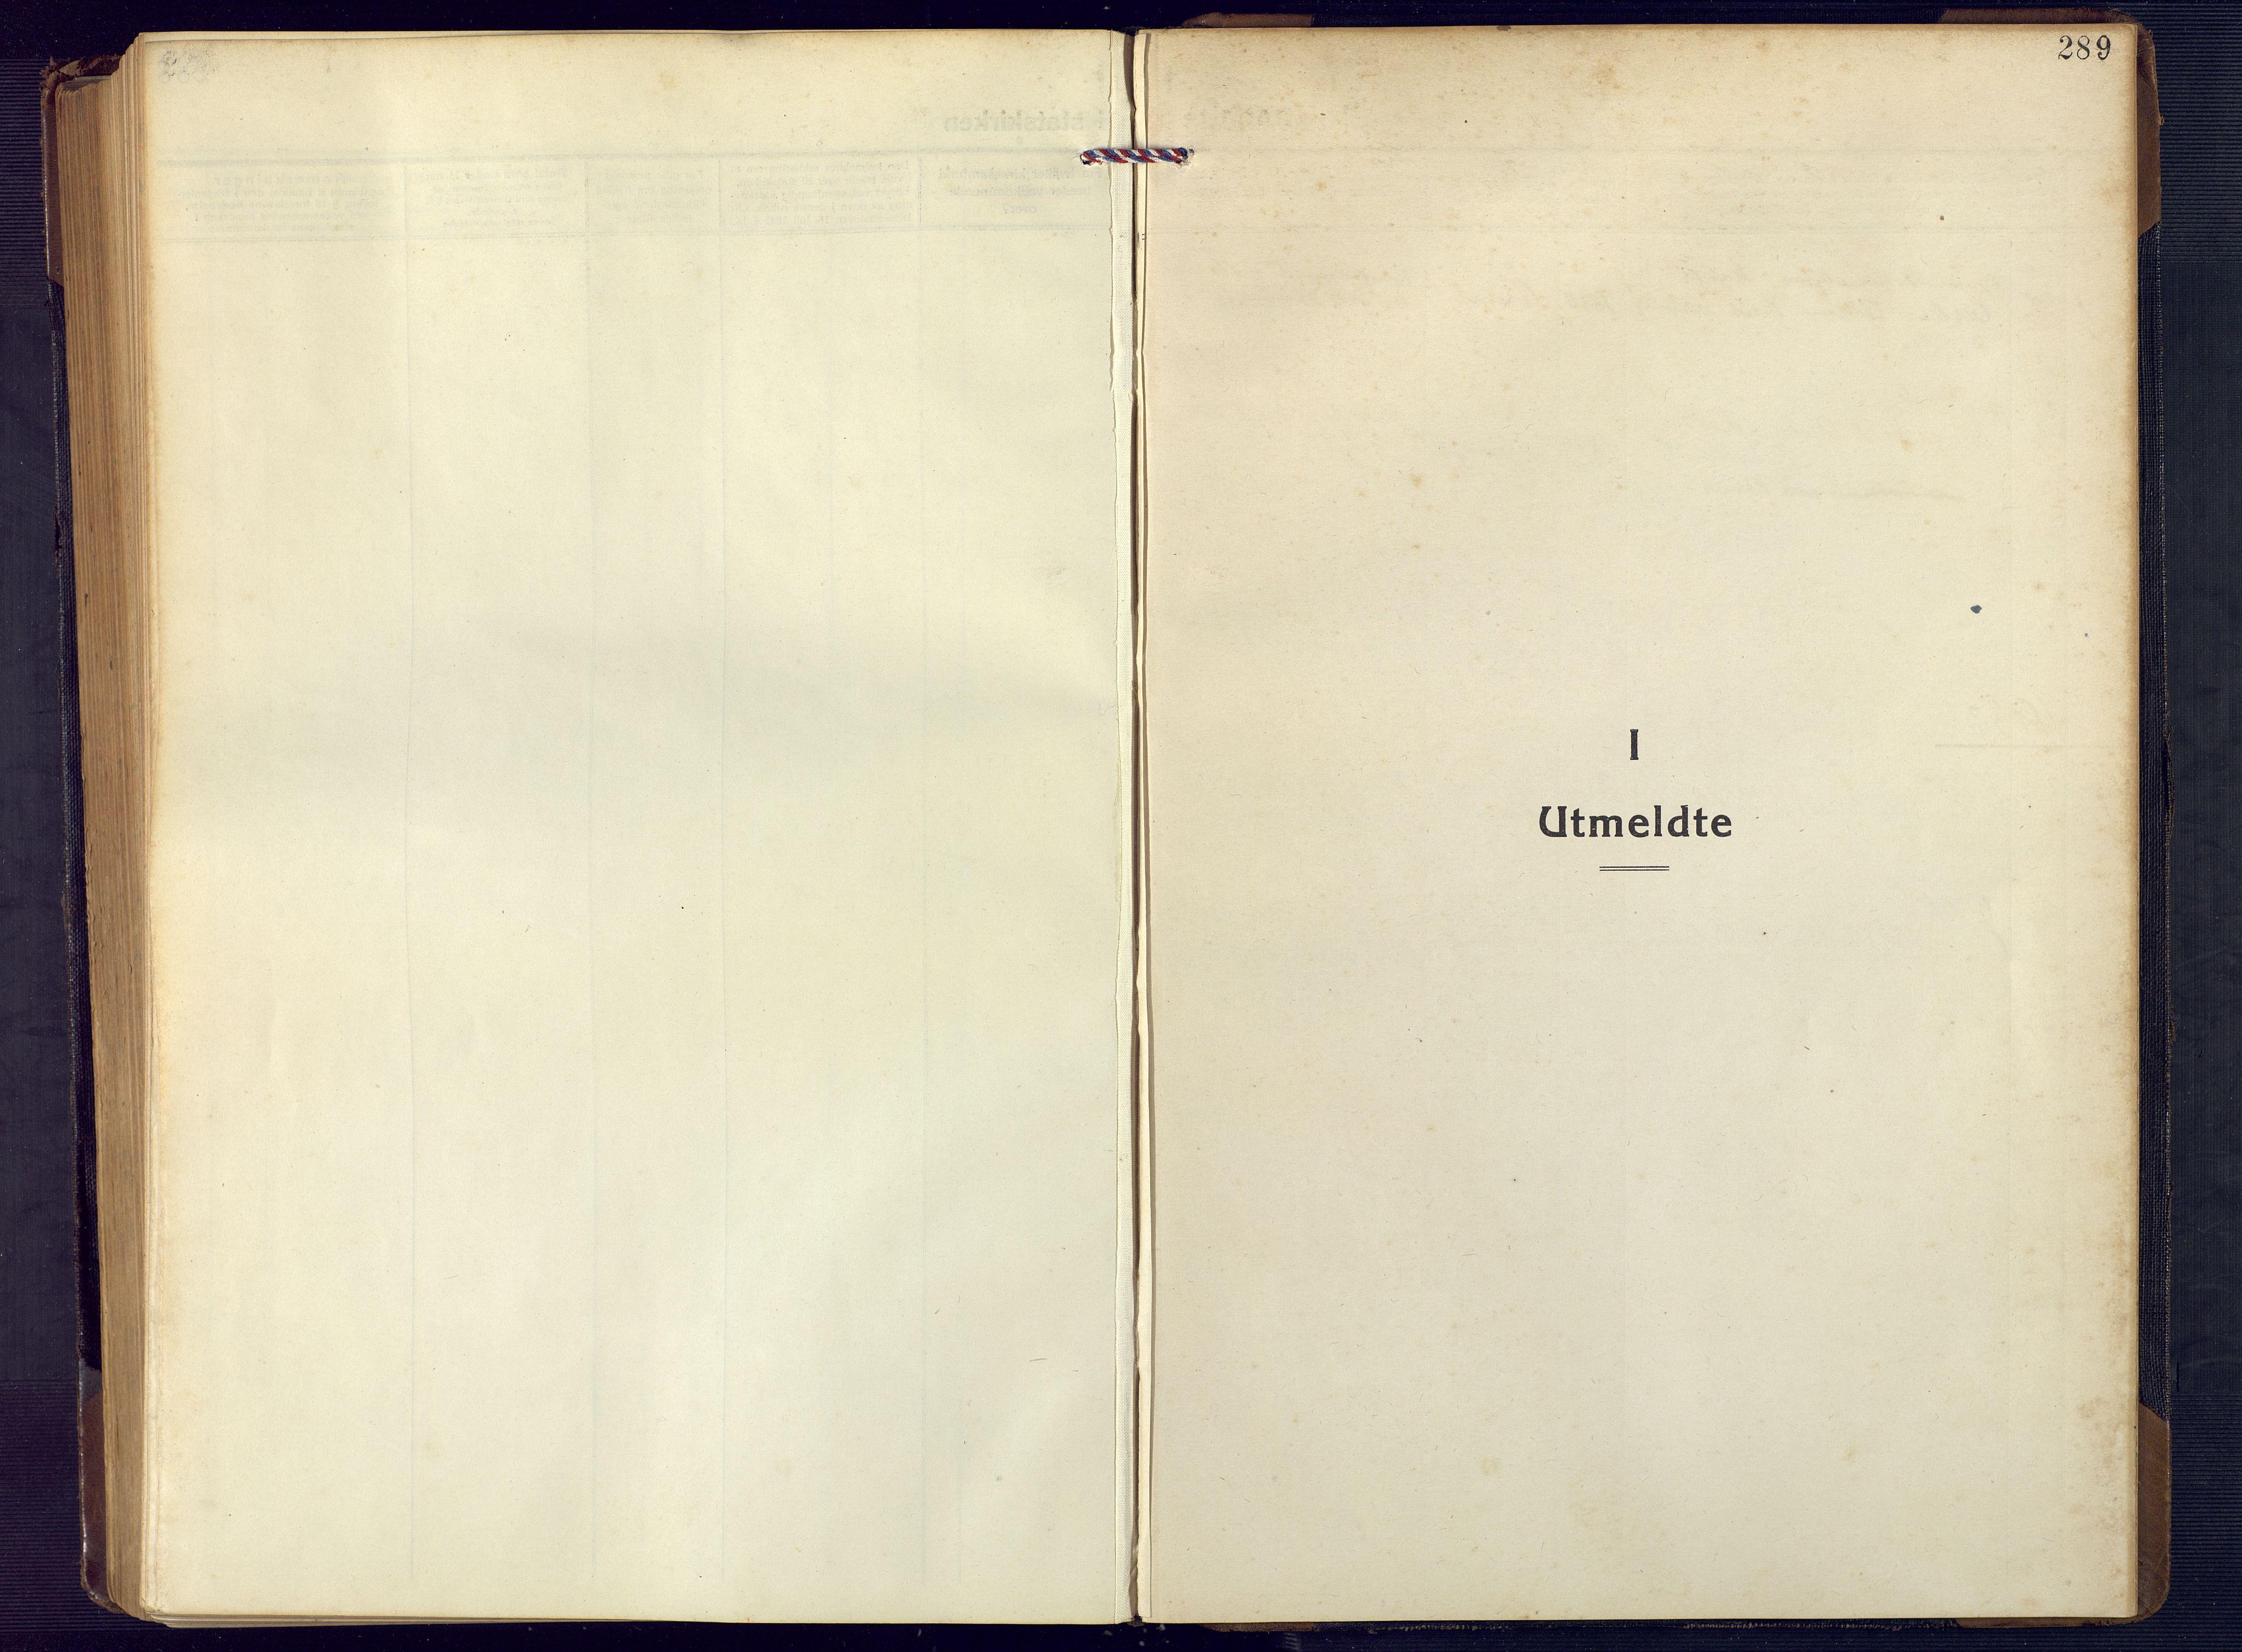 SAK, Åseral sokneprestkontor, F/Fb/L0004: Klokkerbok nr. B 4, 1920-1946, s. 289